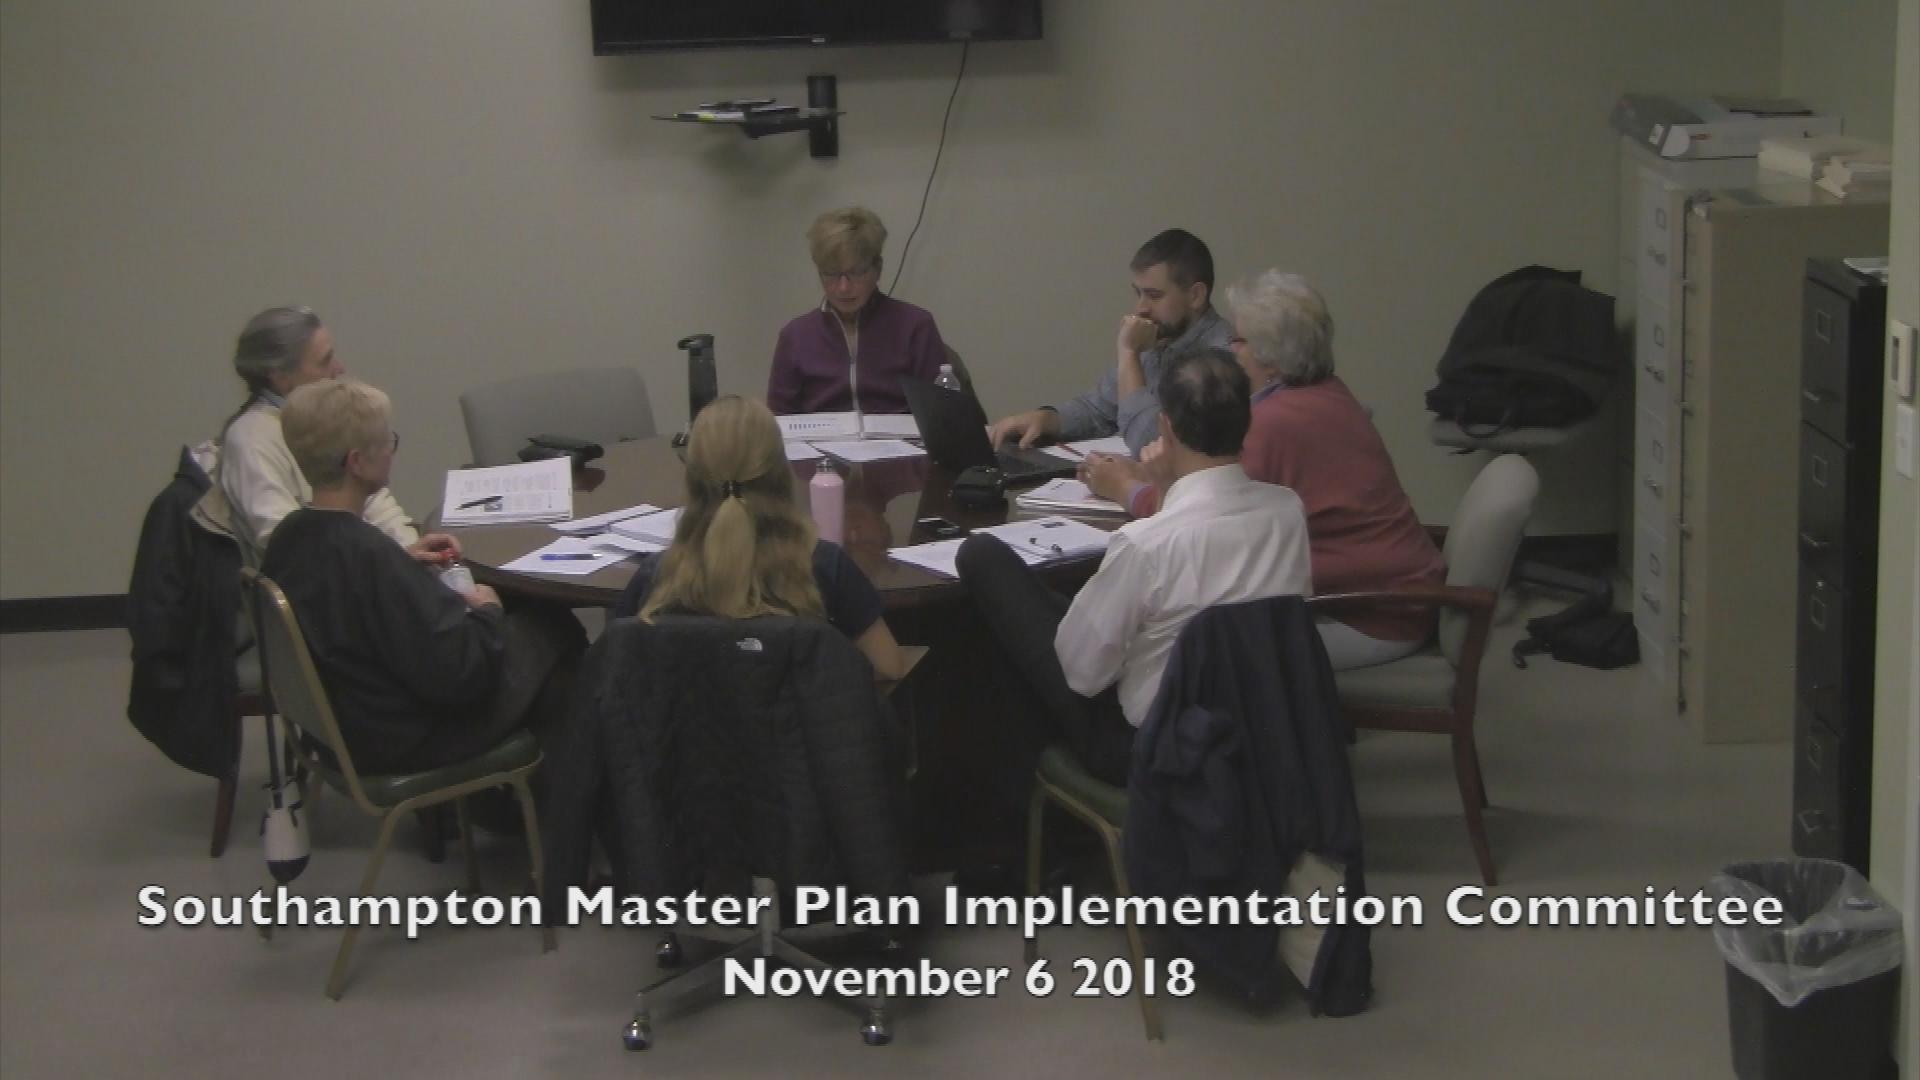 Southampton Master Plan Implementation Committee November 6 2018